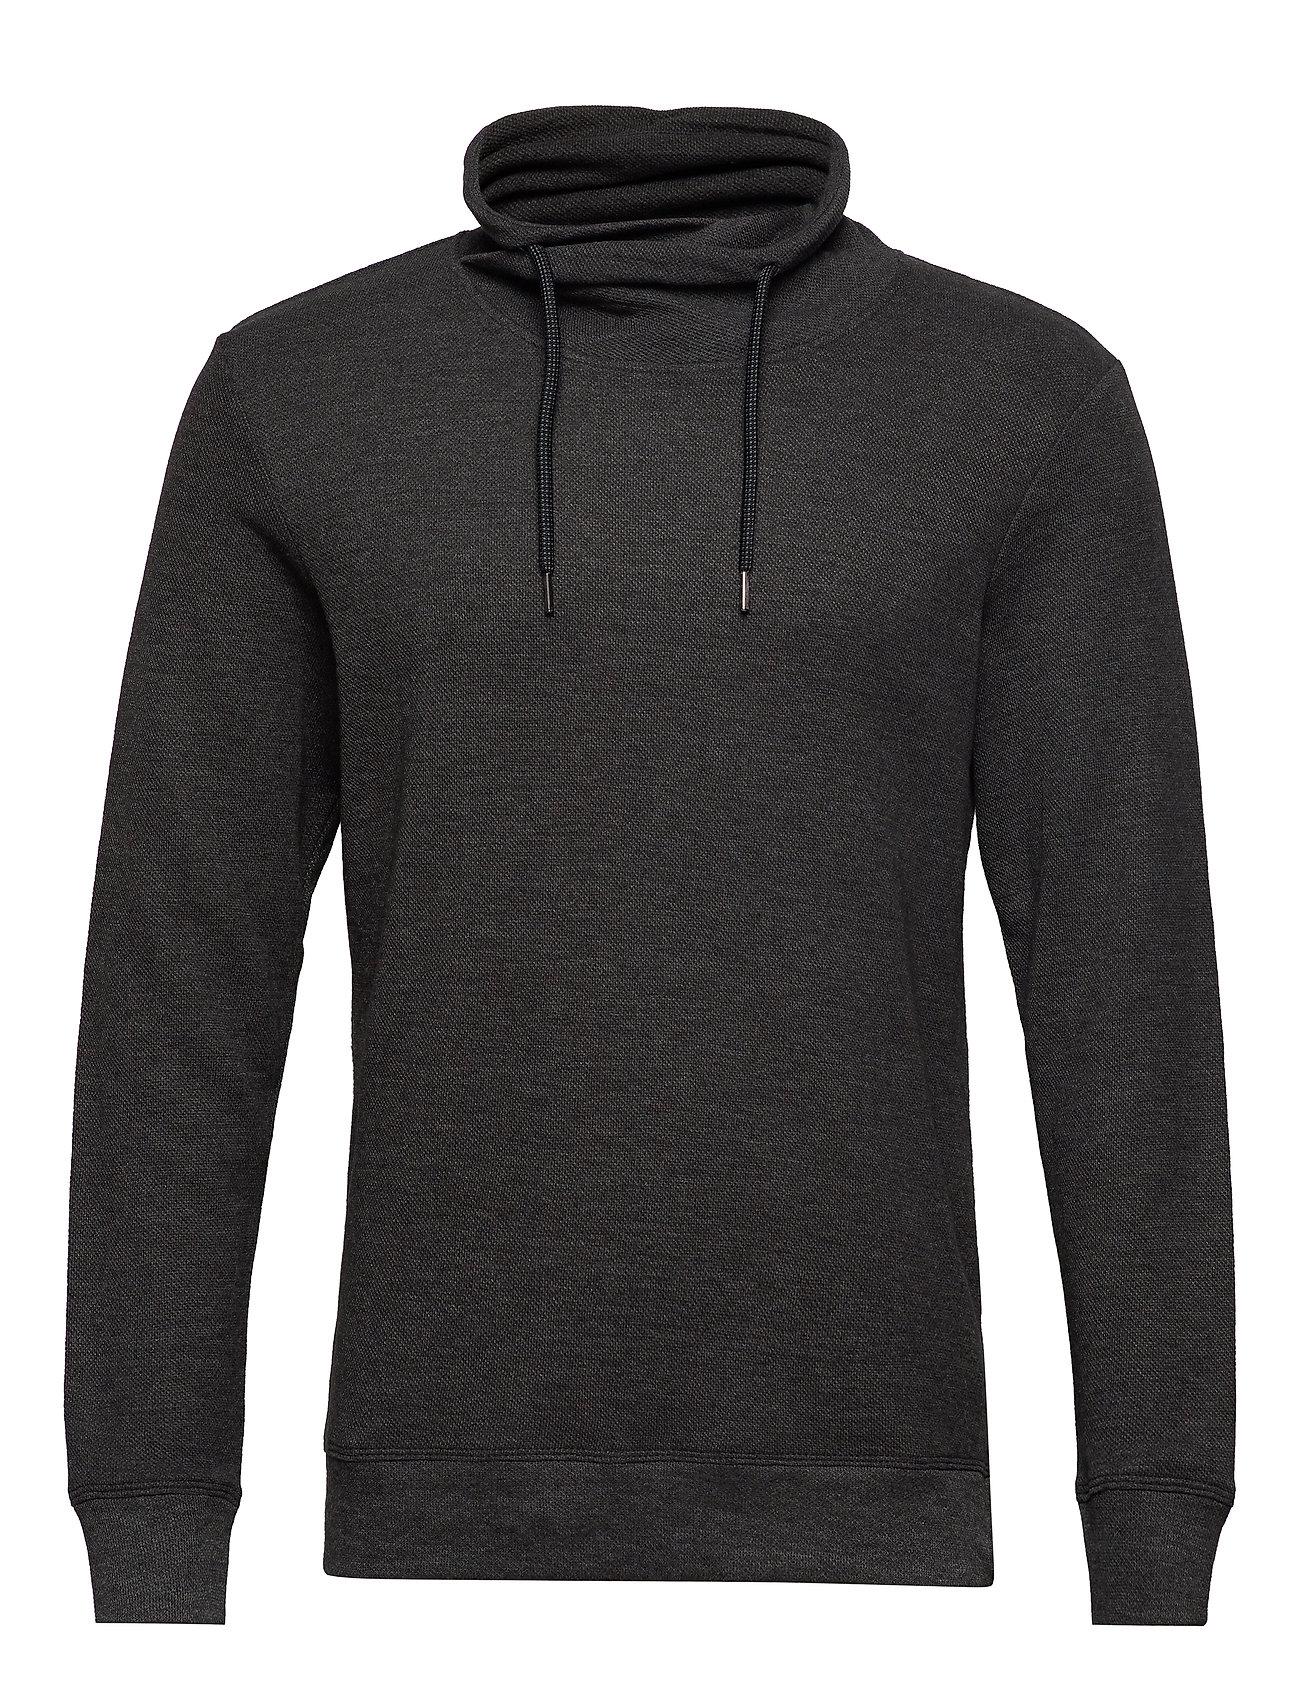 Esprit Casual T-Shirts - DARK GREY